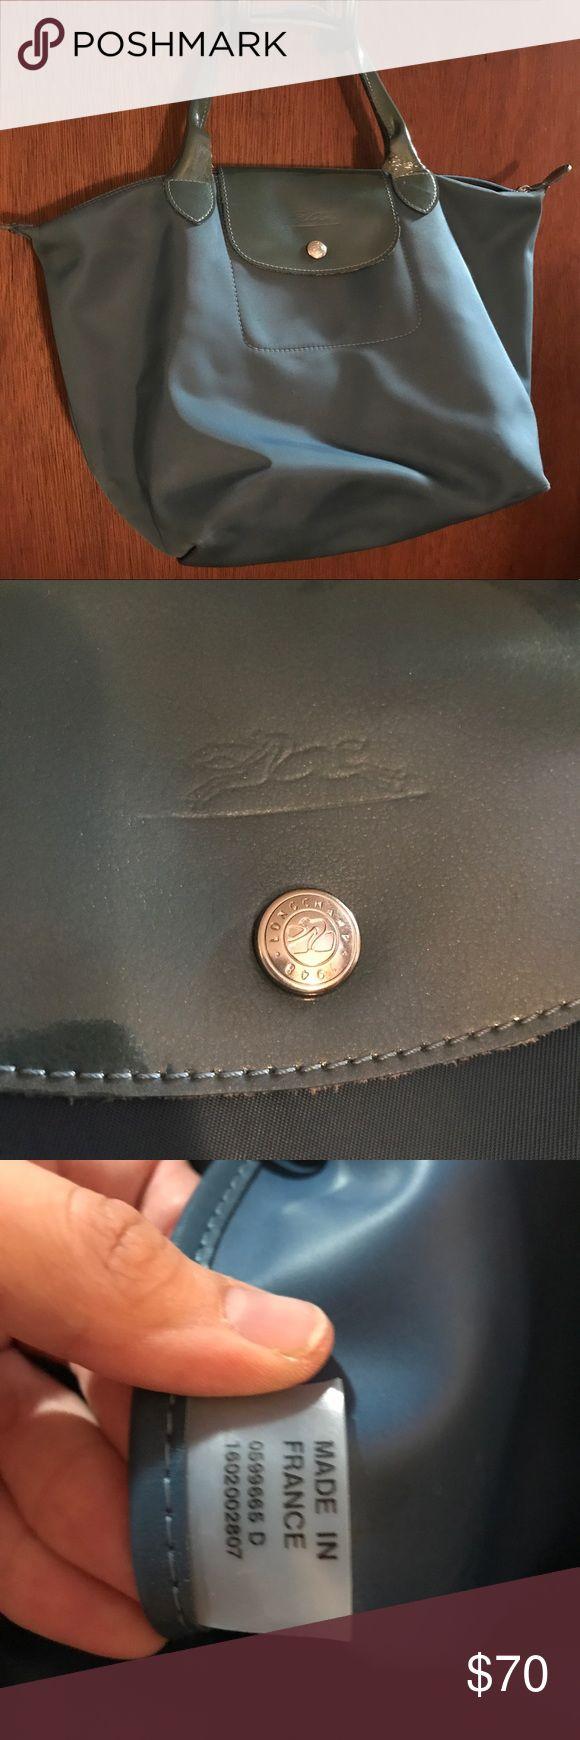 Longchamp Women's Purse Light Blue Medium Pliage Bag. Few Small Marks. Beautiful Bag. Great Christmas Present. Longchamp Bags Satchels